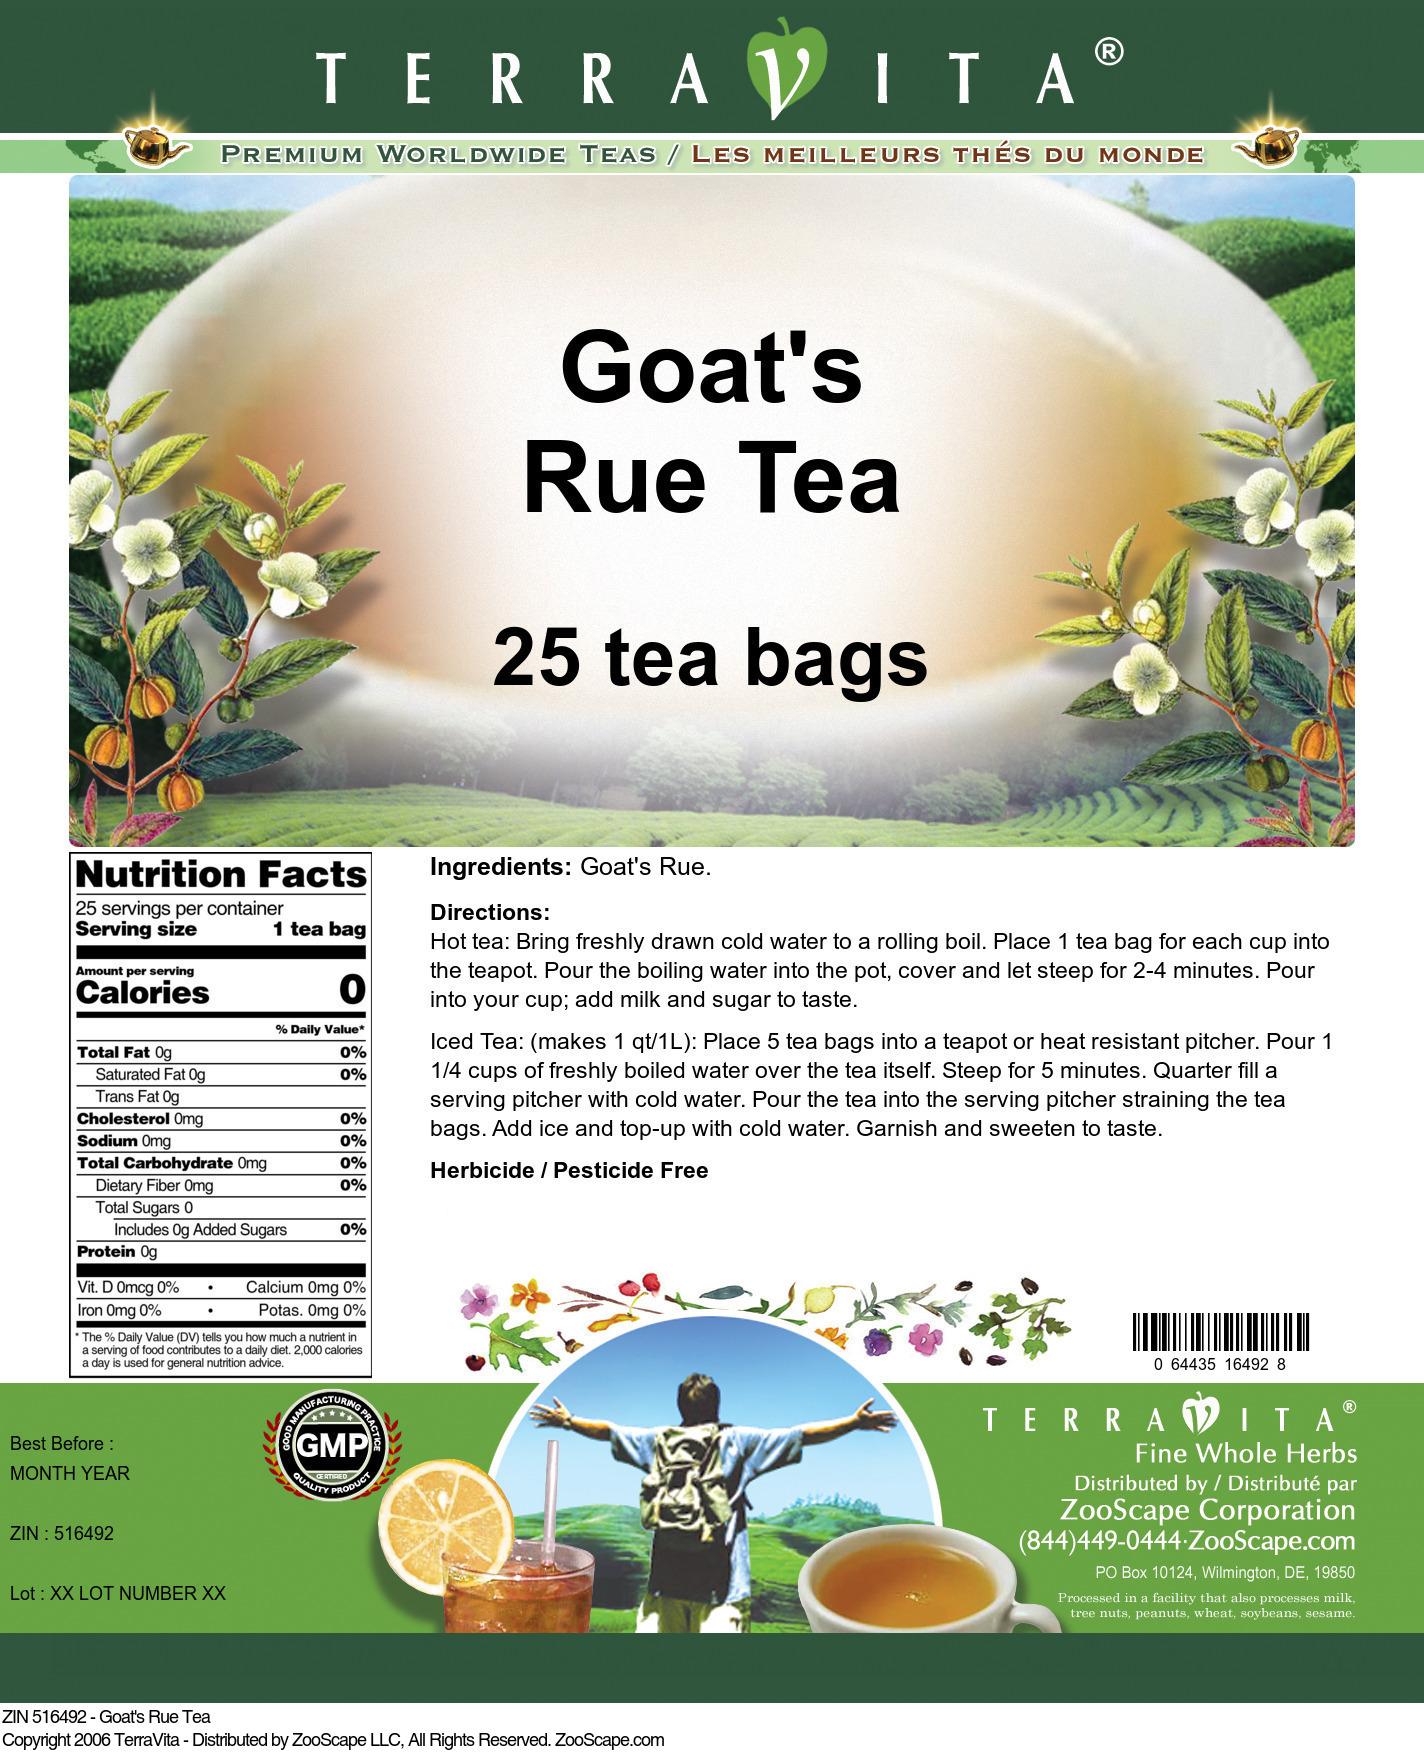 Goat's Rue Tea